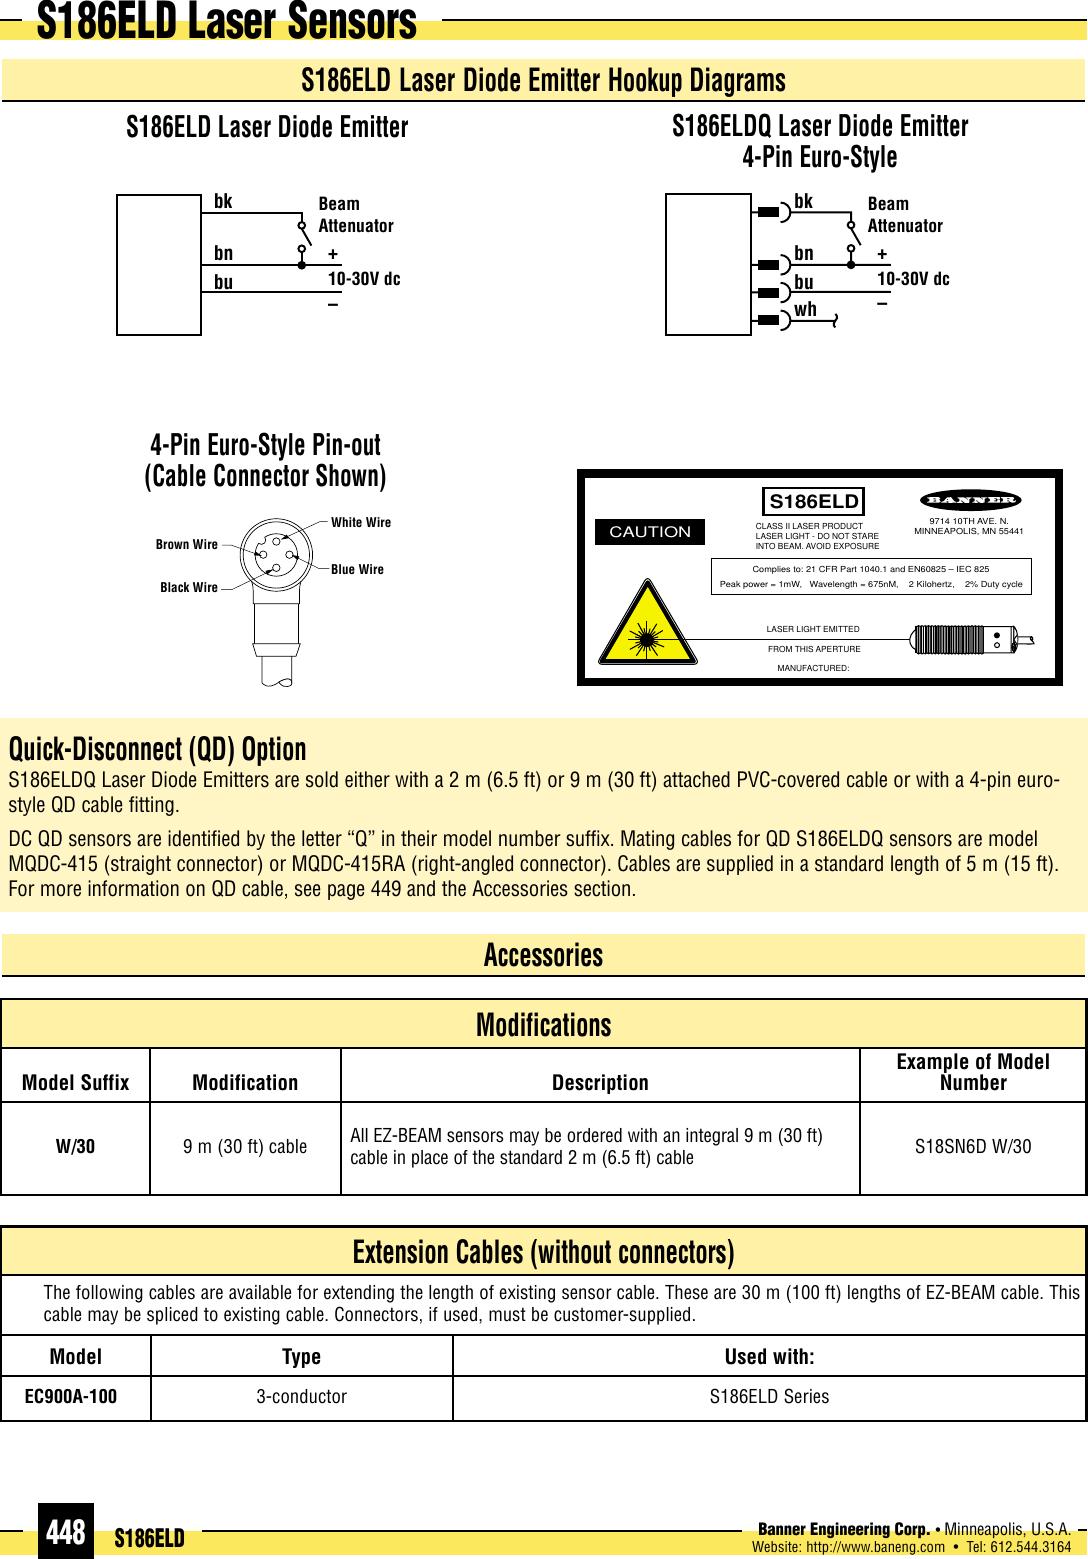 Standard Proximity Switch Wiring Diagram. Pnp Diagram ... on